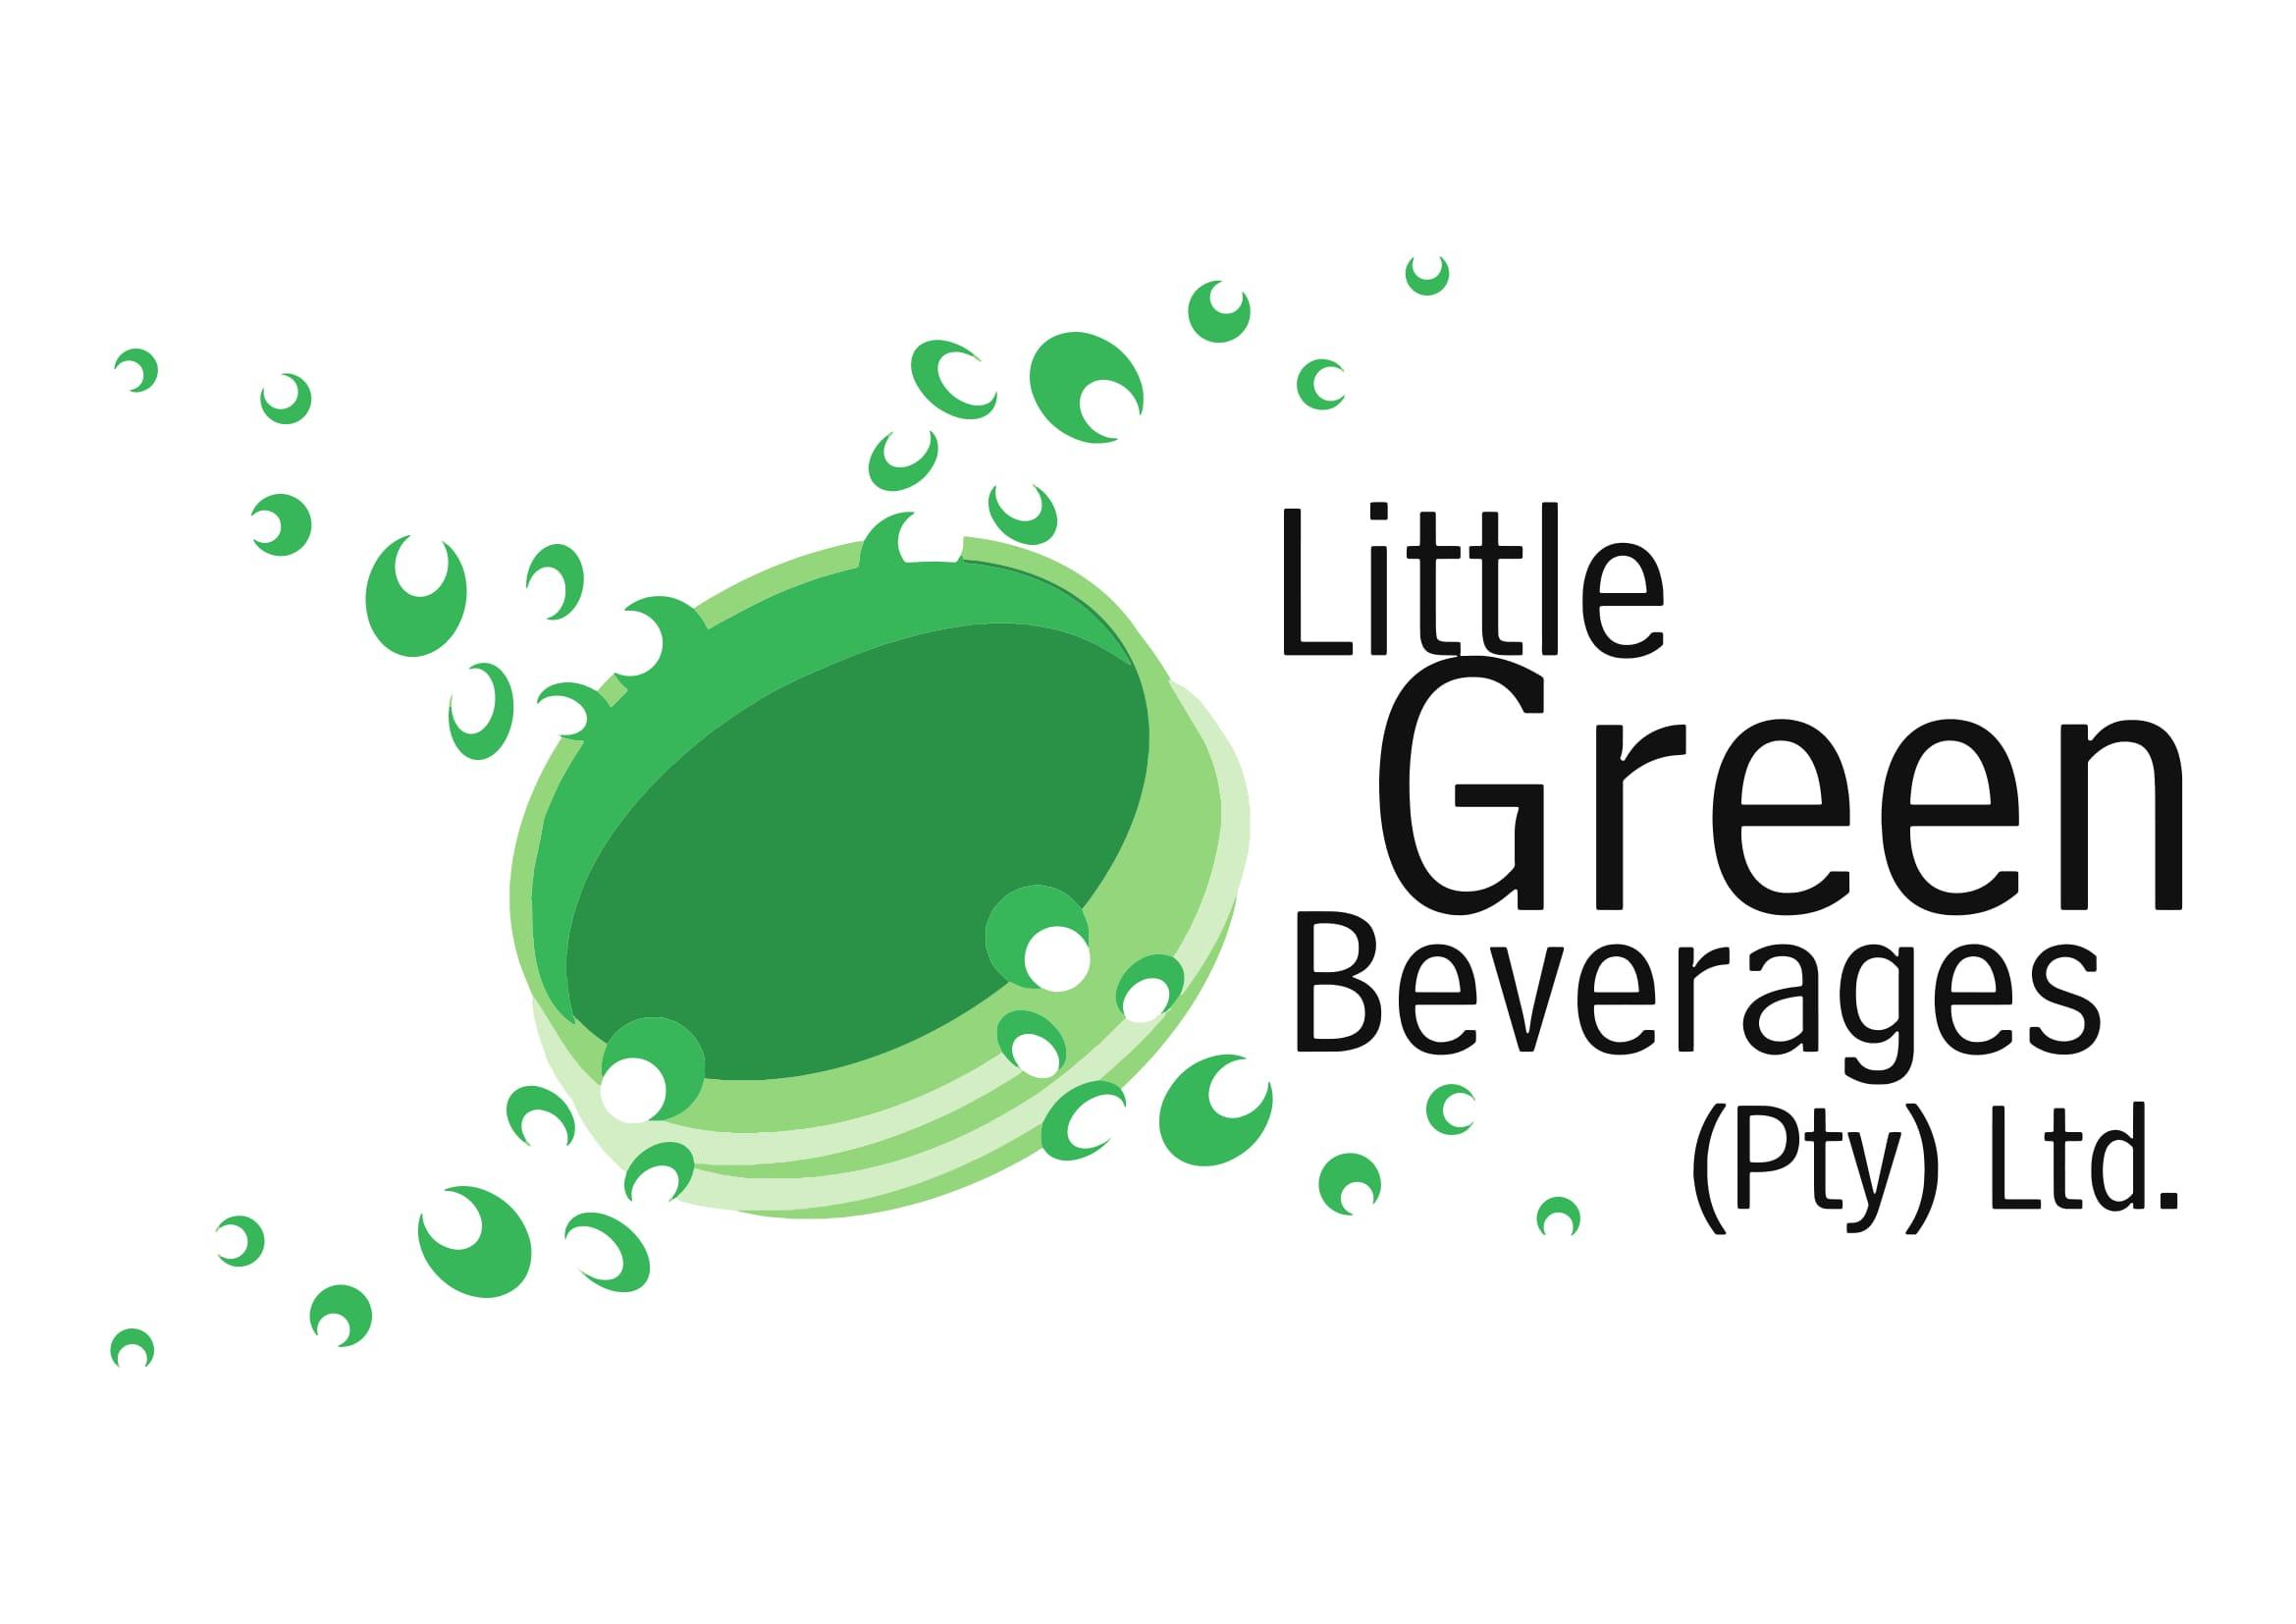 Little Green Beverages (Pty) Ltd.